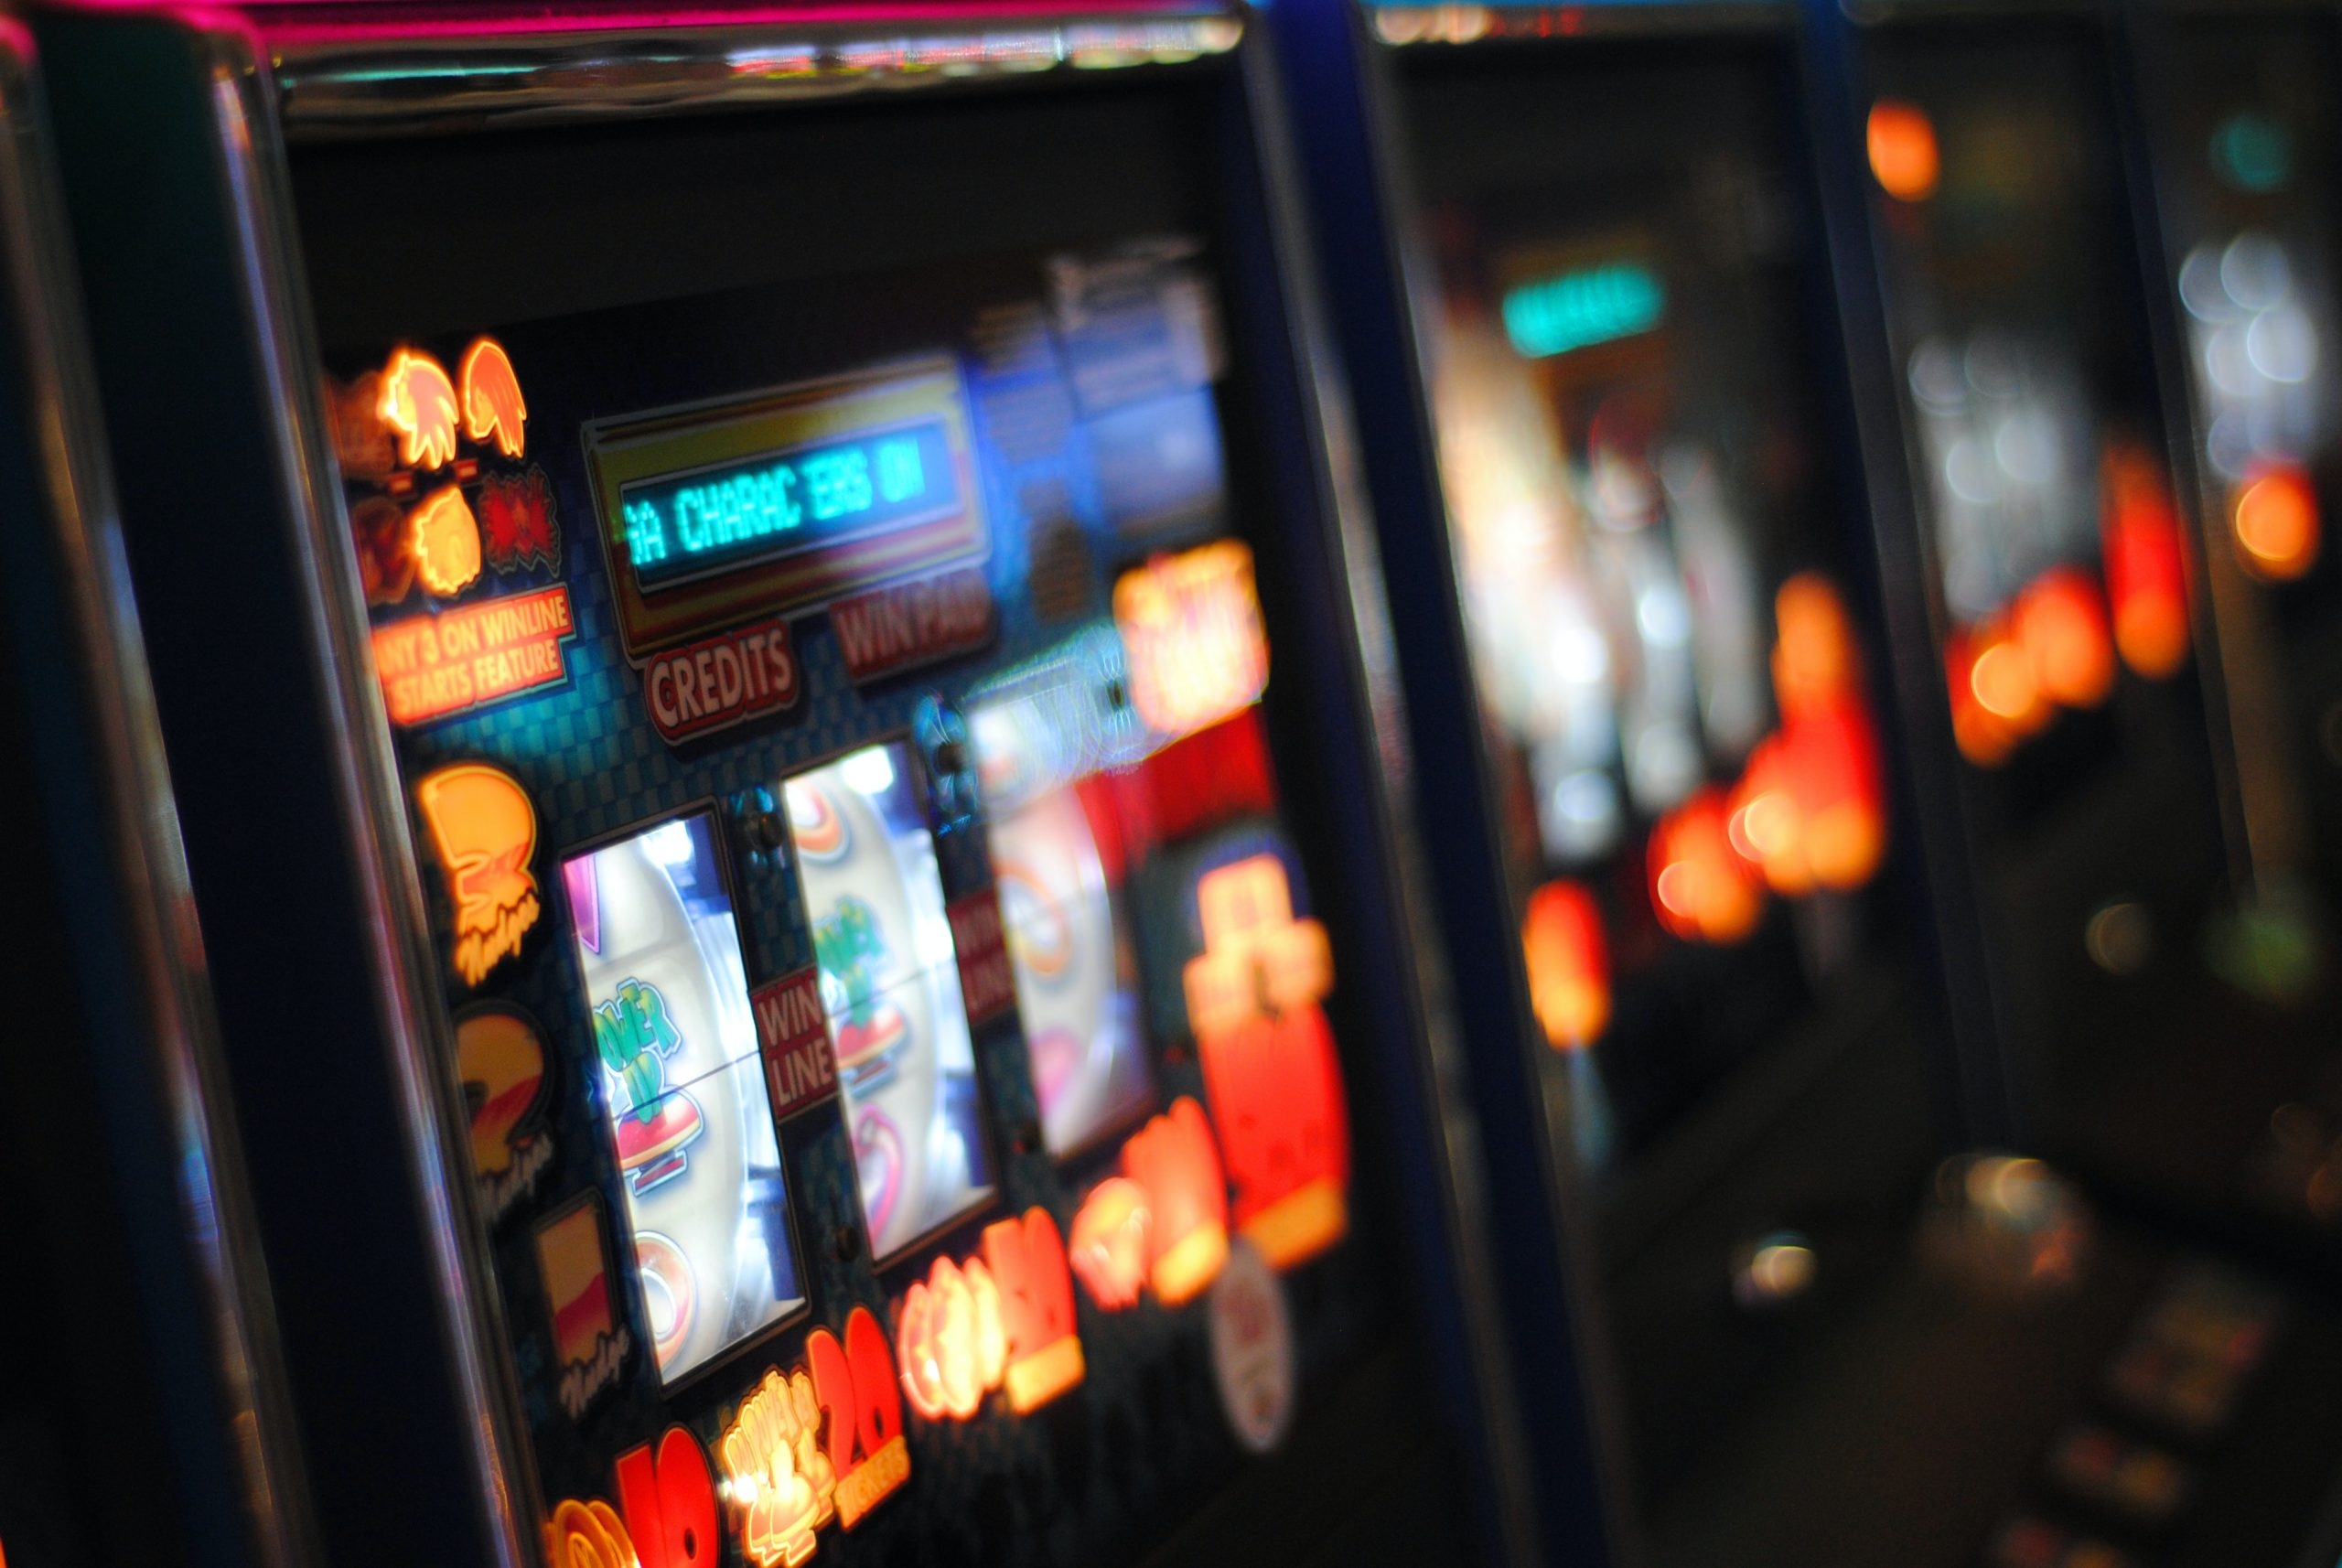 NI Resident Survey Shows Gambling Laws Need Update